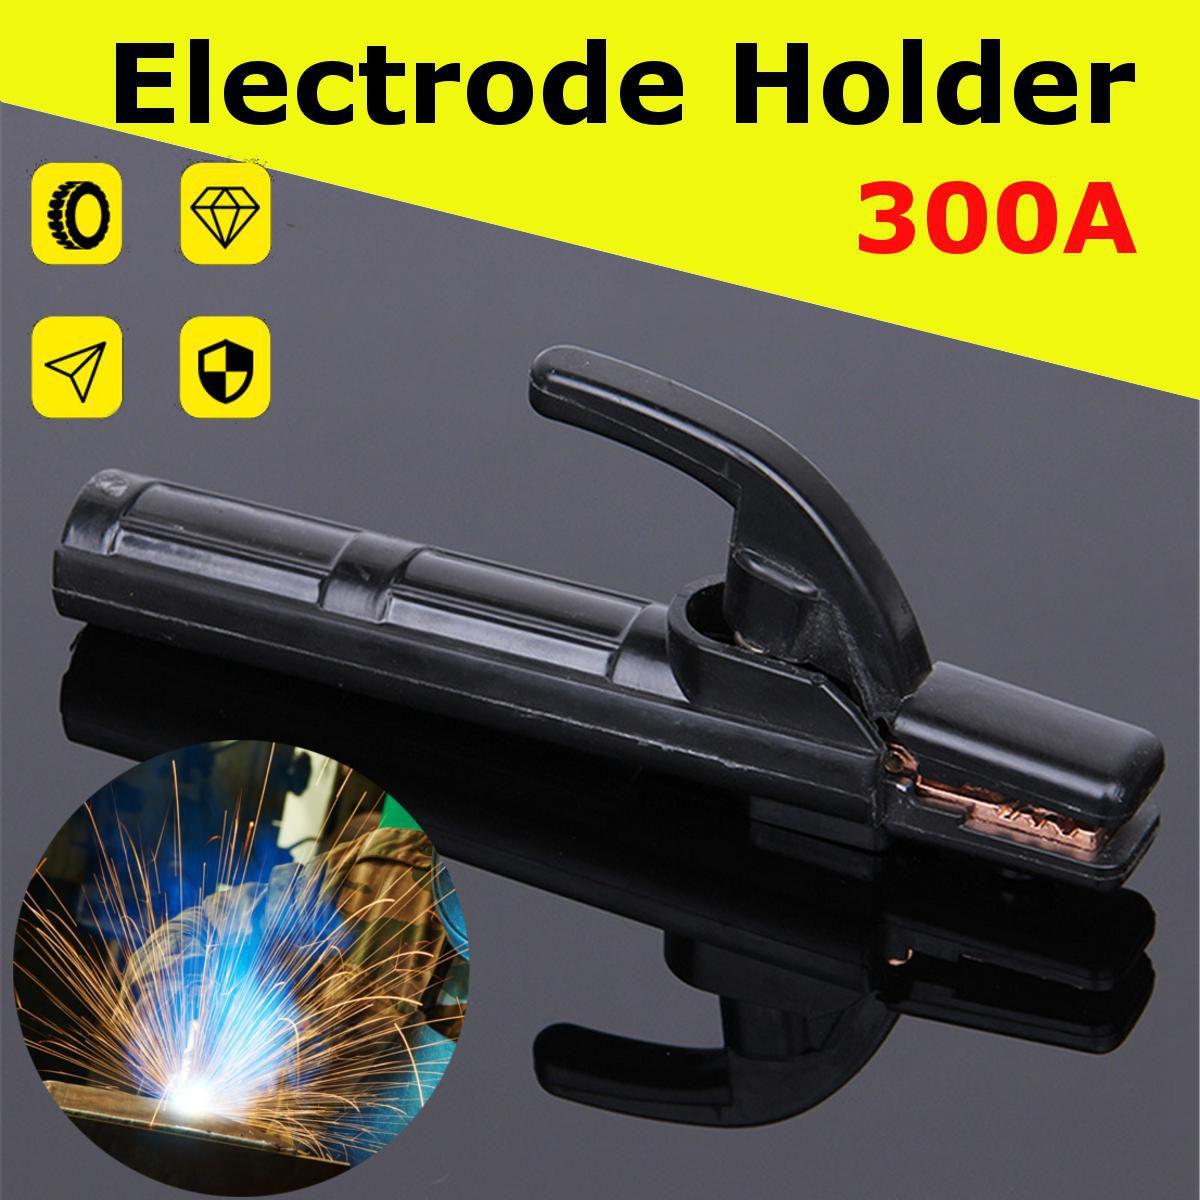 1x Electrode Holder 300A Solder Stick Copper Rod Clamp Tool Heat Resistant